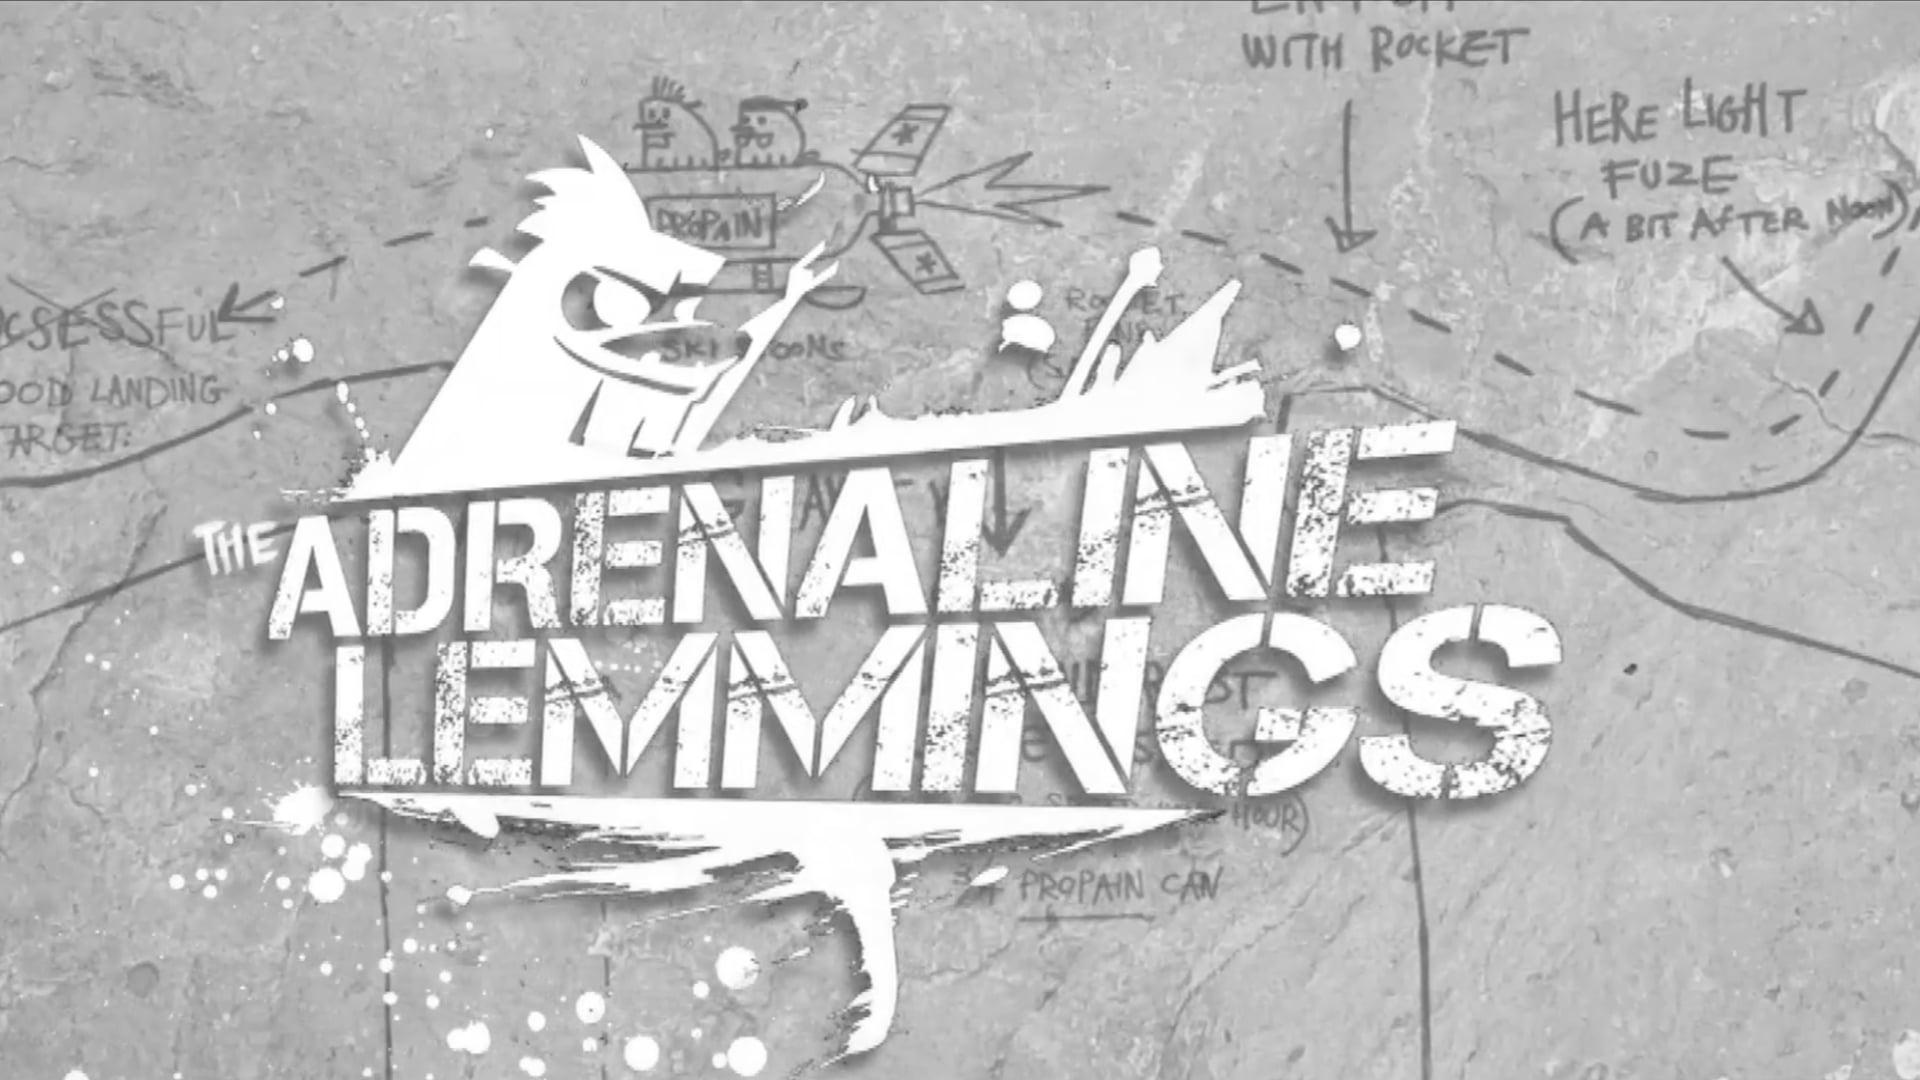 Adrenaline Lemmings